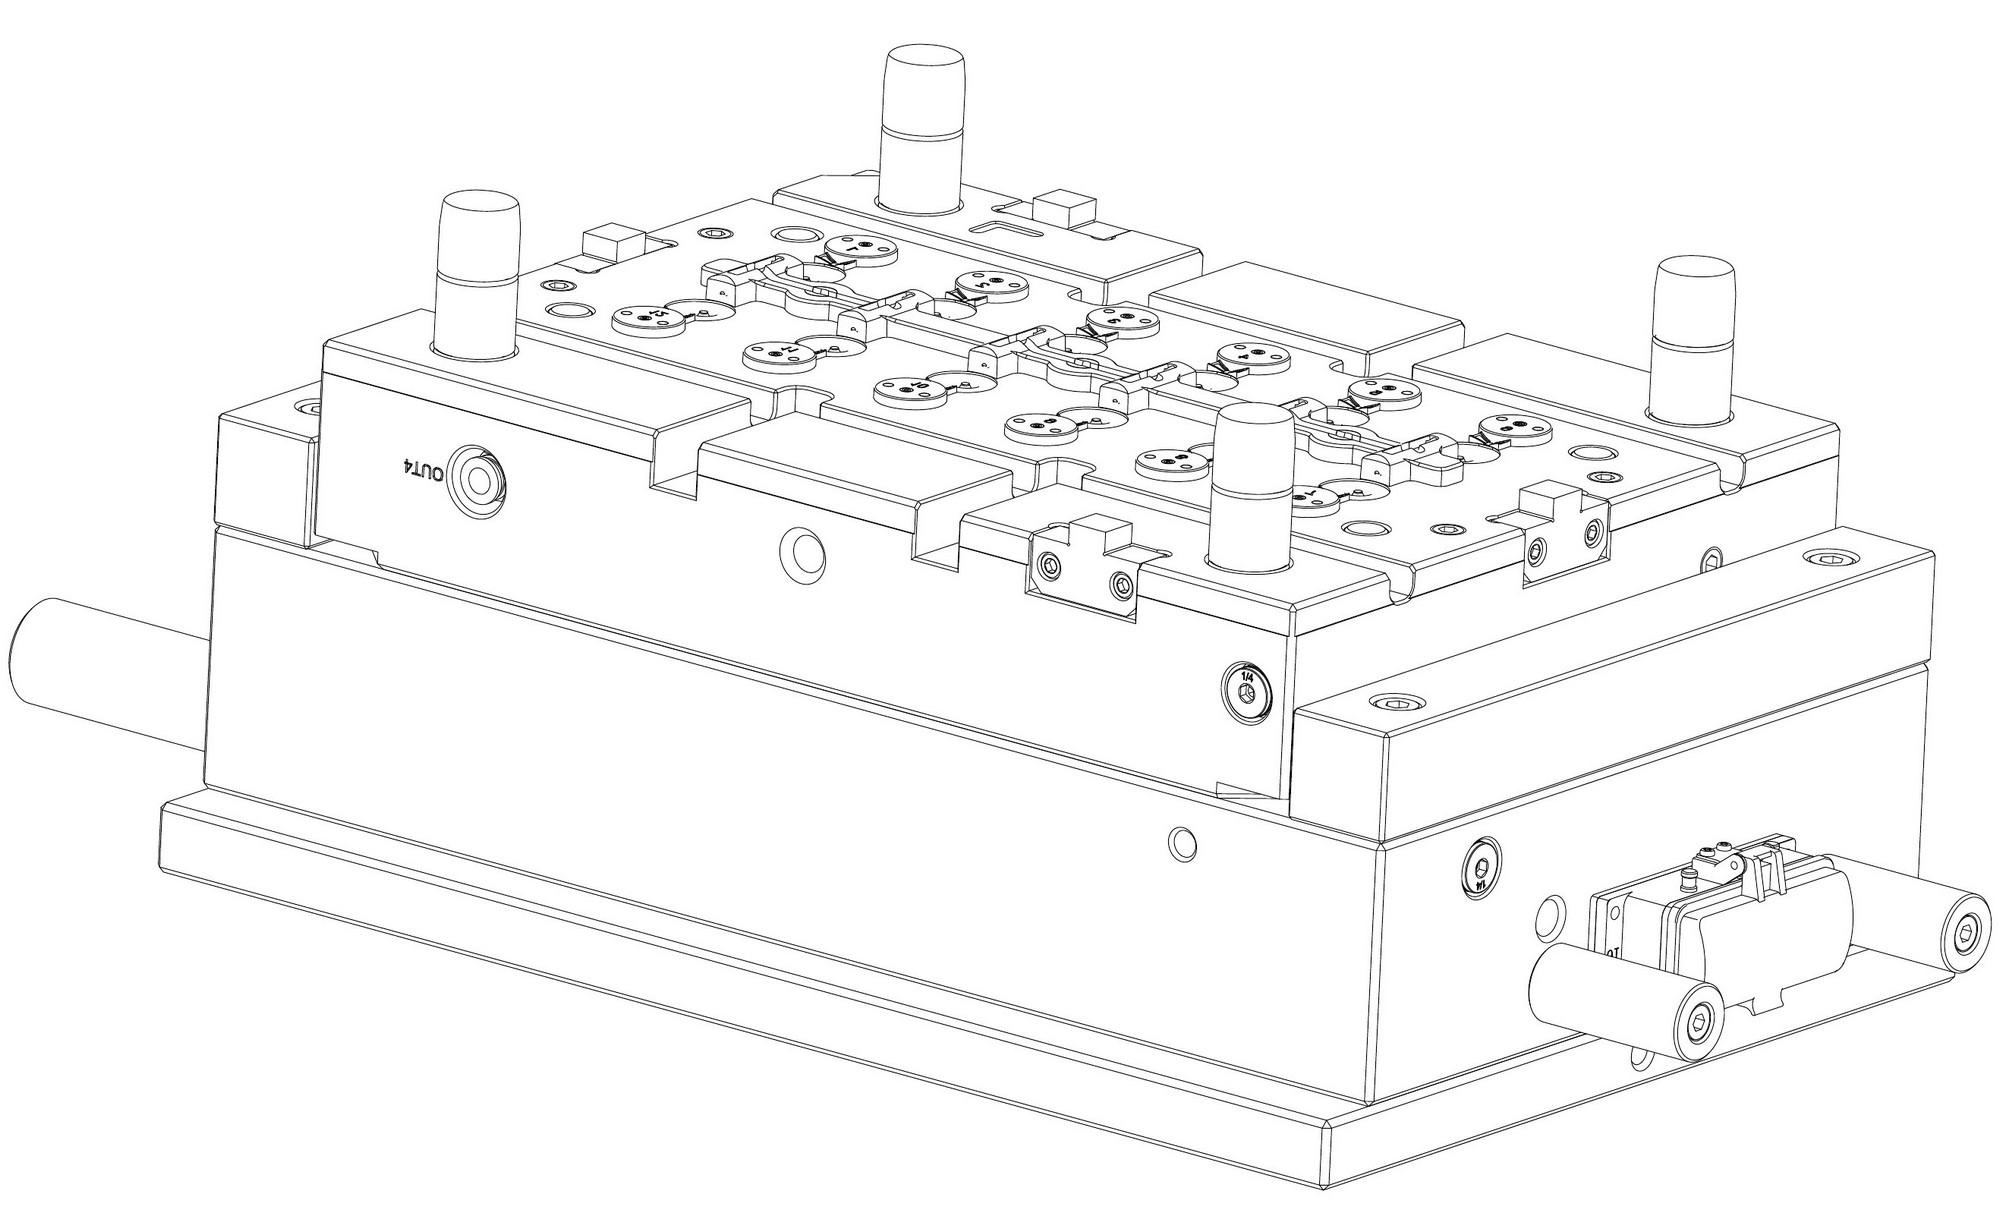 engineering plastic injection